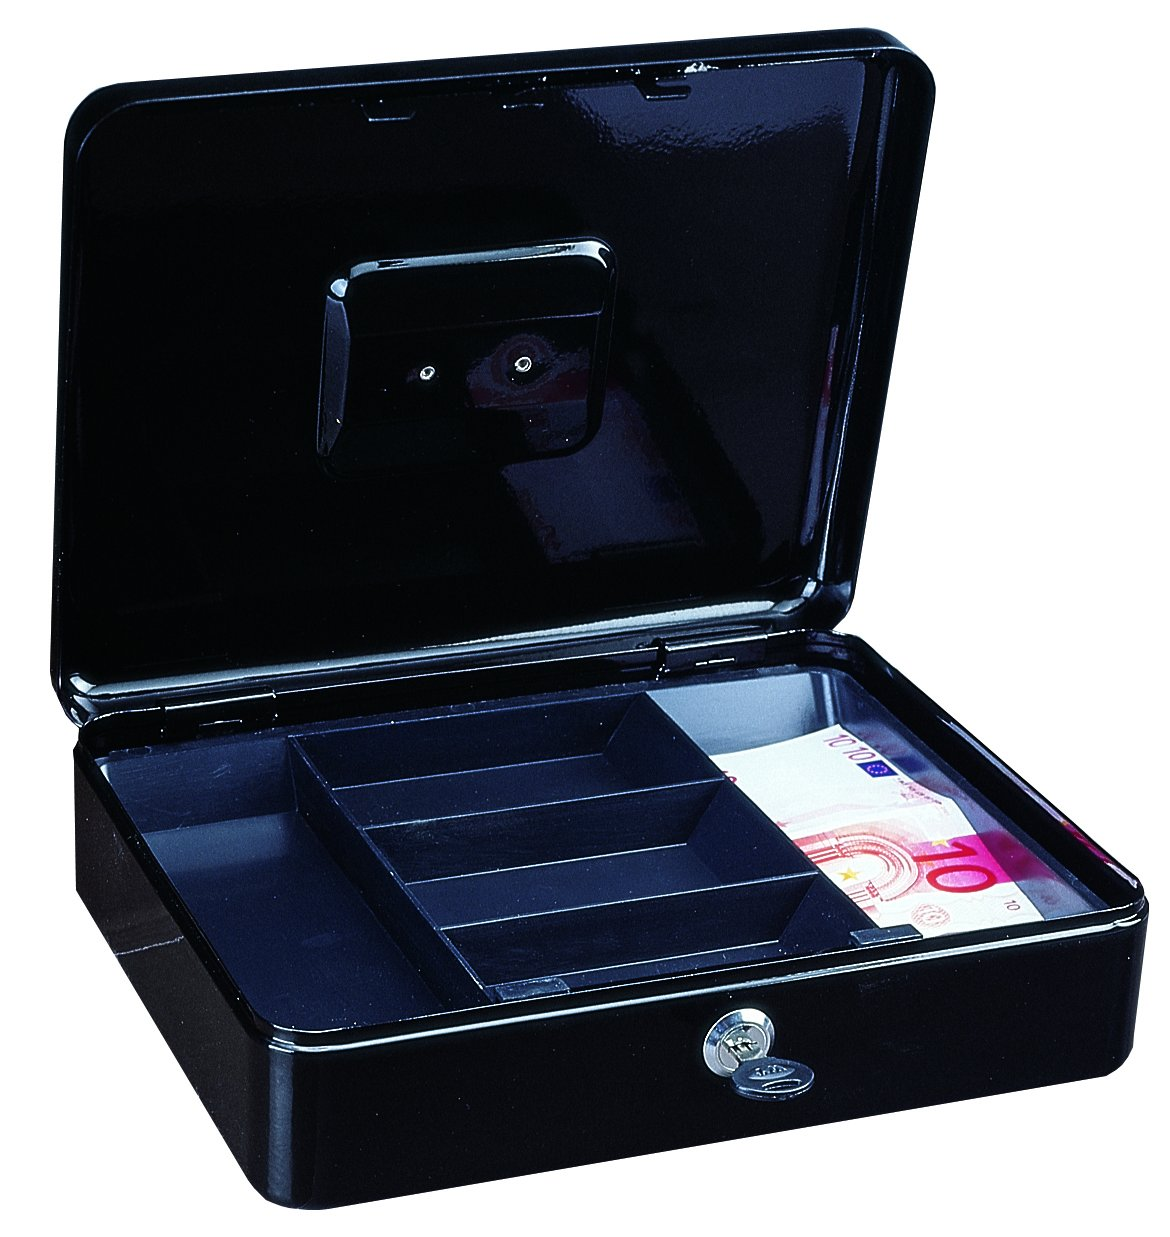 HomeDesign 104433 HDK-2400-Black Key